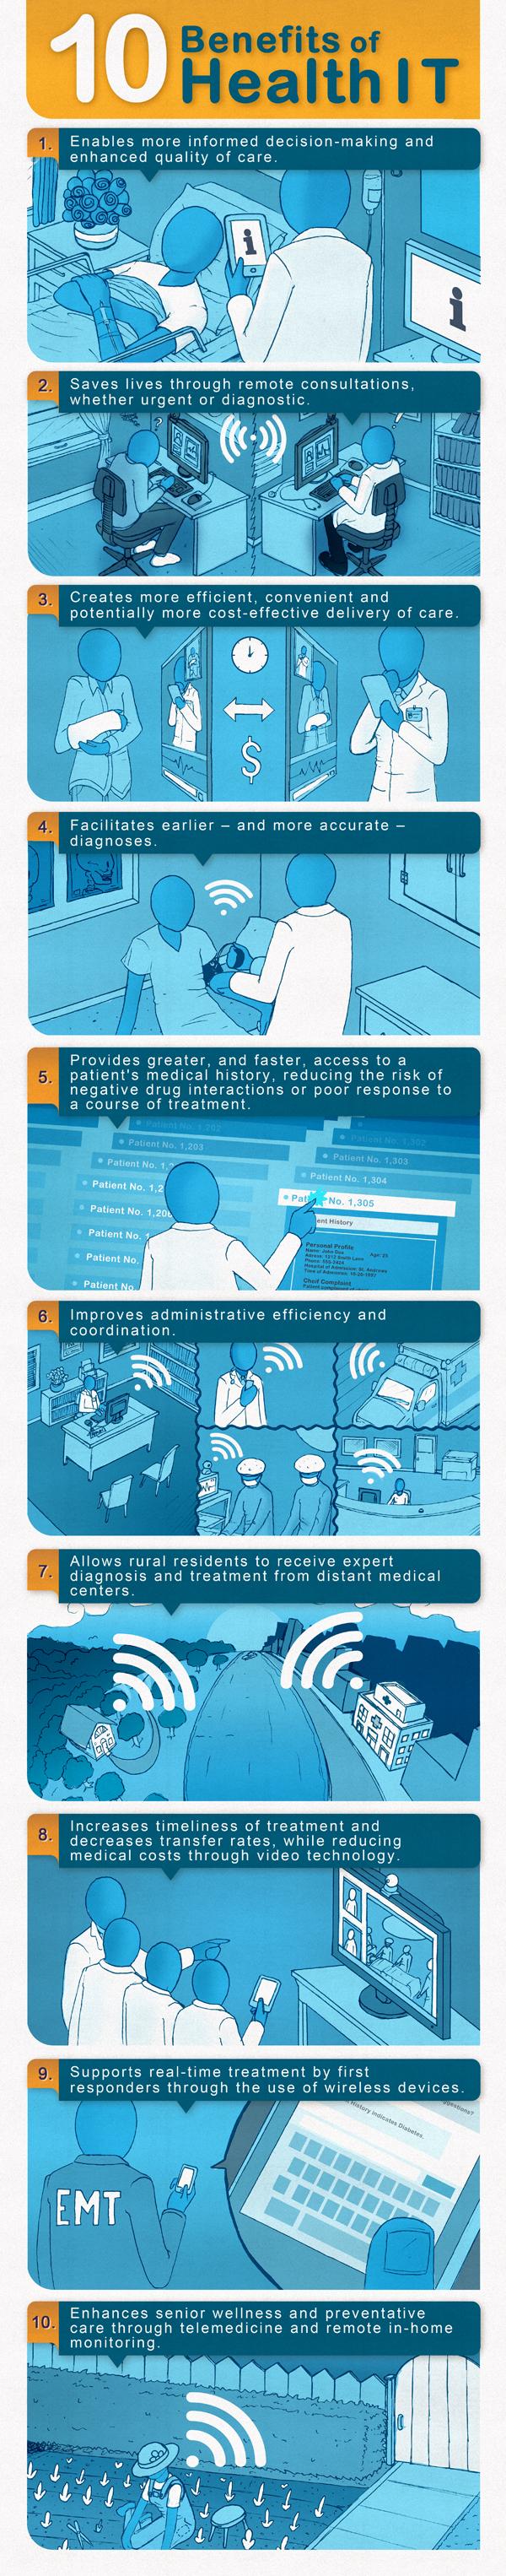 10 Benefits of Health IT Infographic